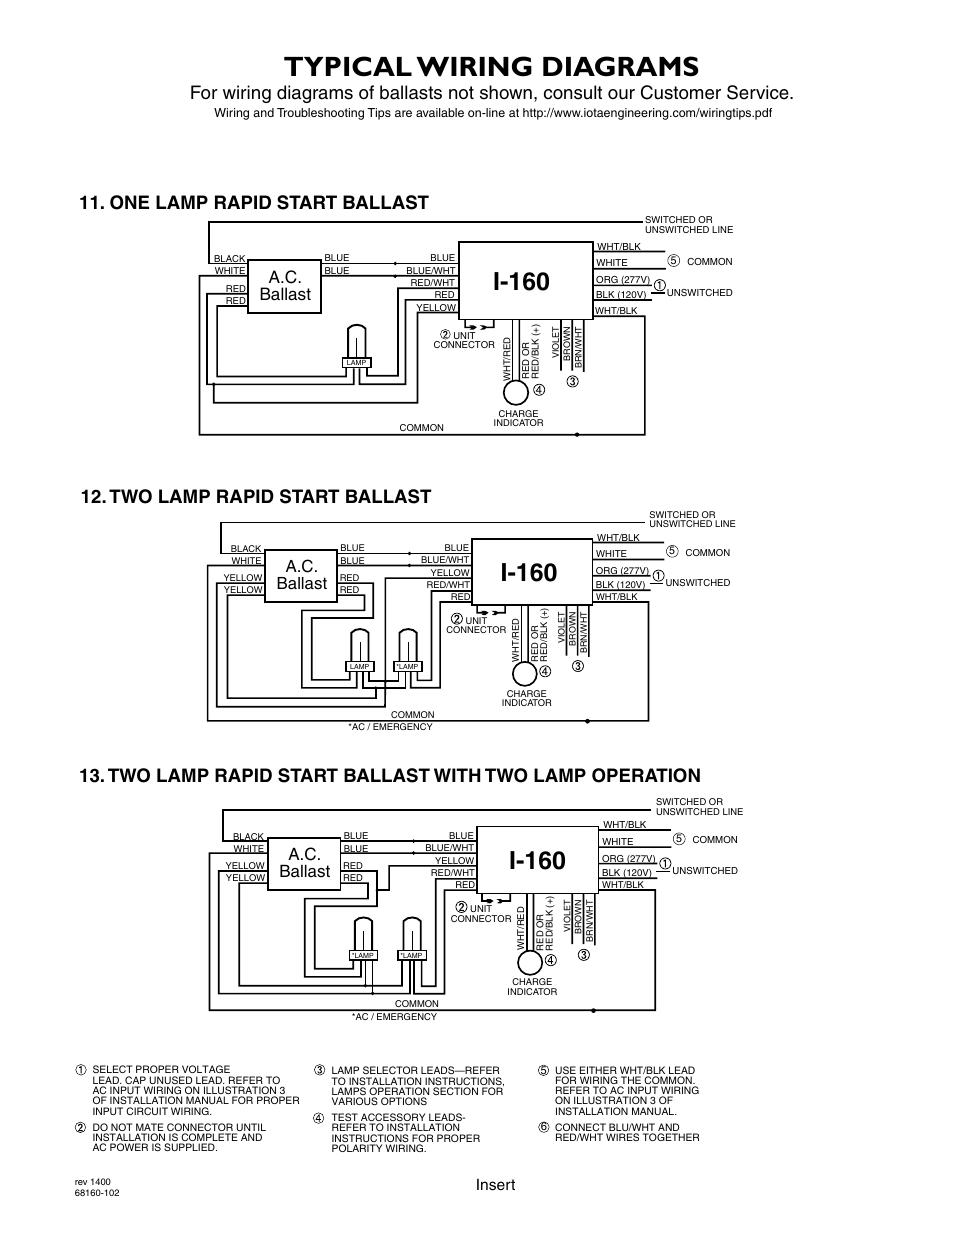 Advance Dimming Ballast Wiring Diagram Ballast Schematic Electronic Ballast Schematic